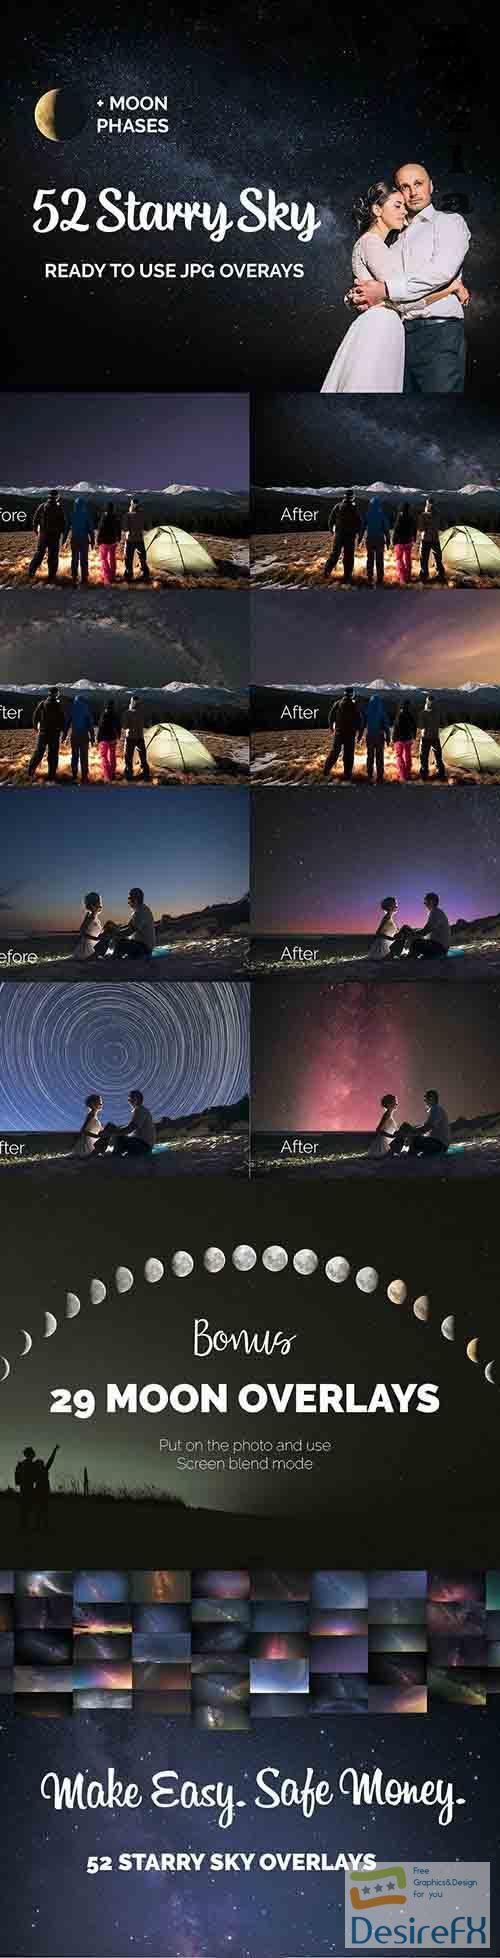 52 Starry Sky Photo Overlays - 27017653